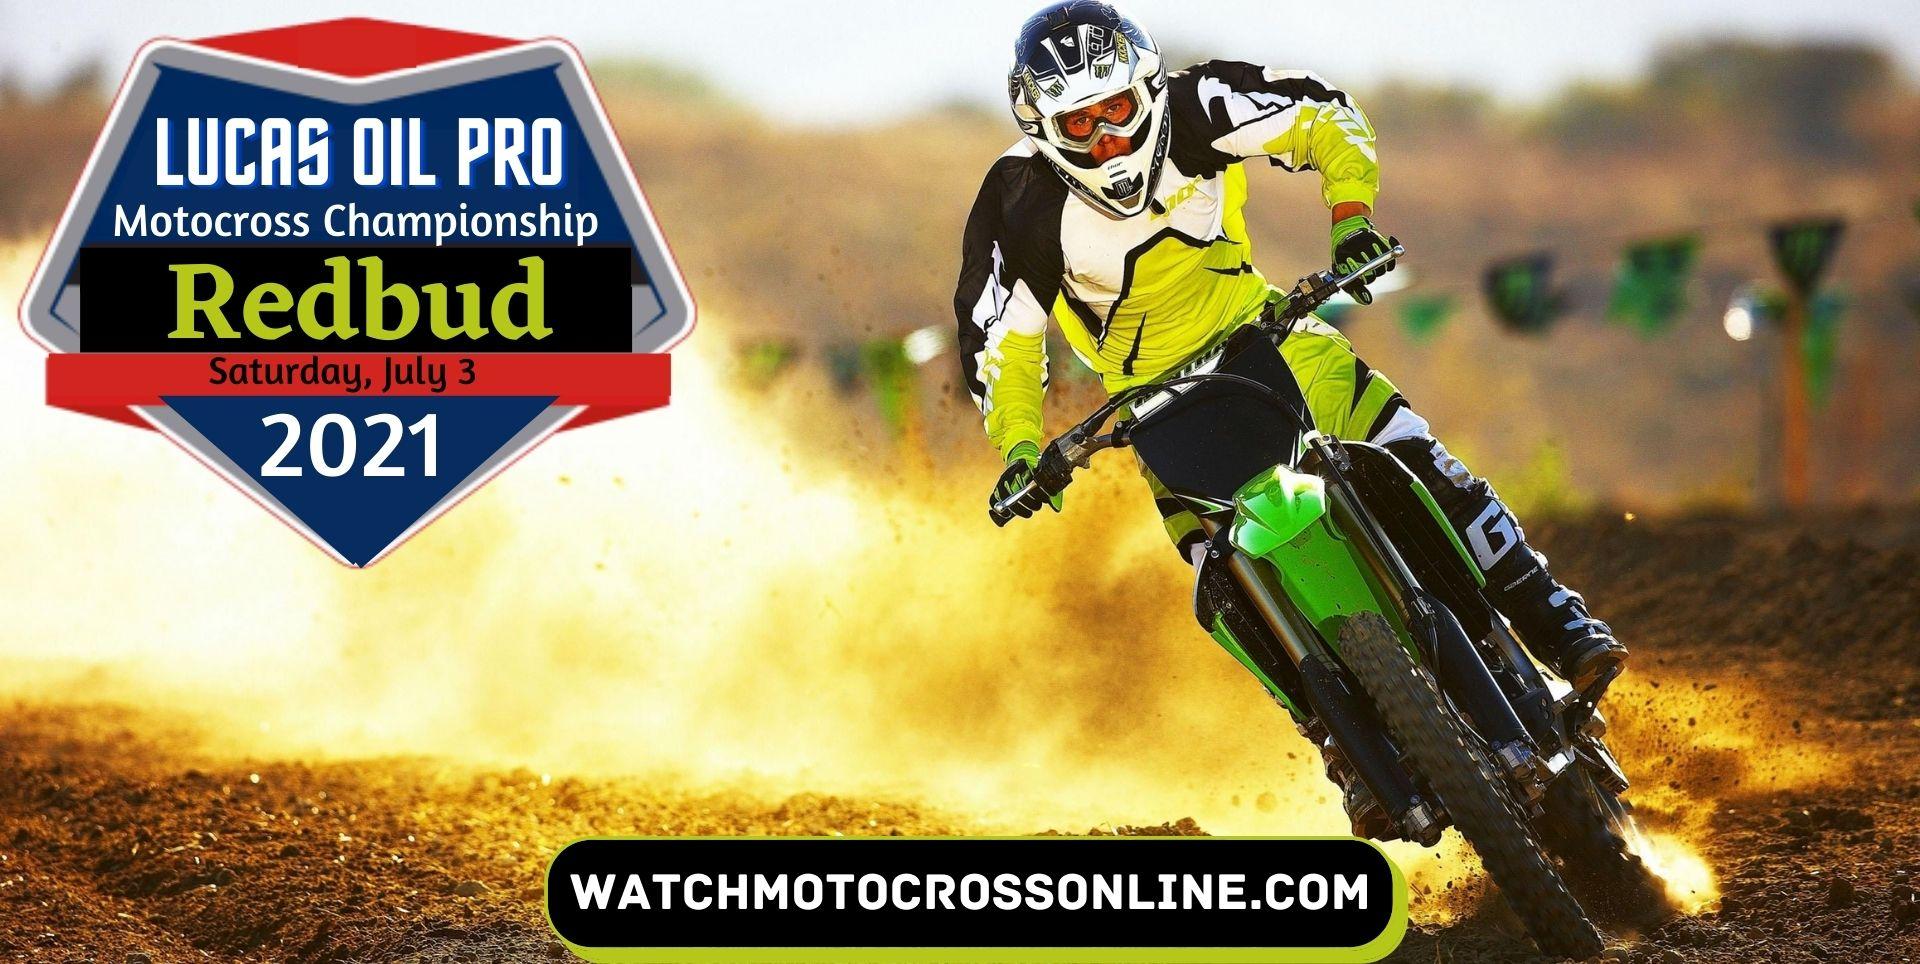 Redbud Motocross Live Stream 2021